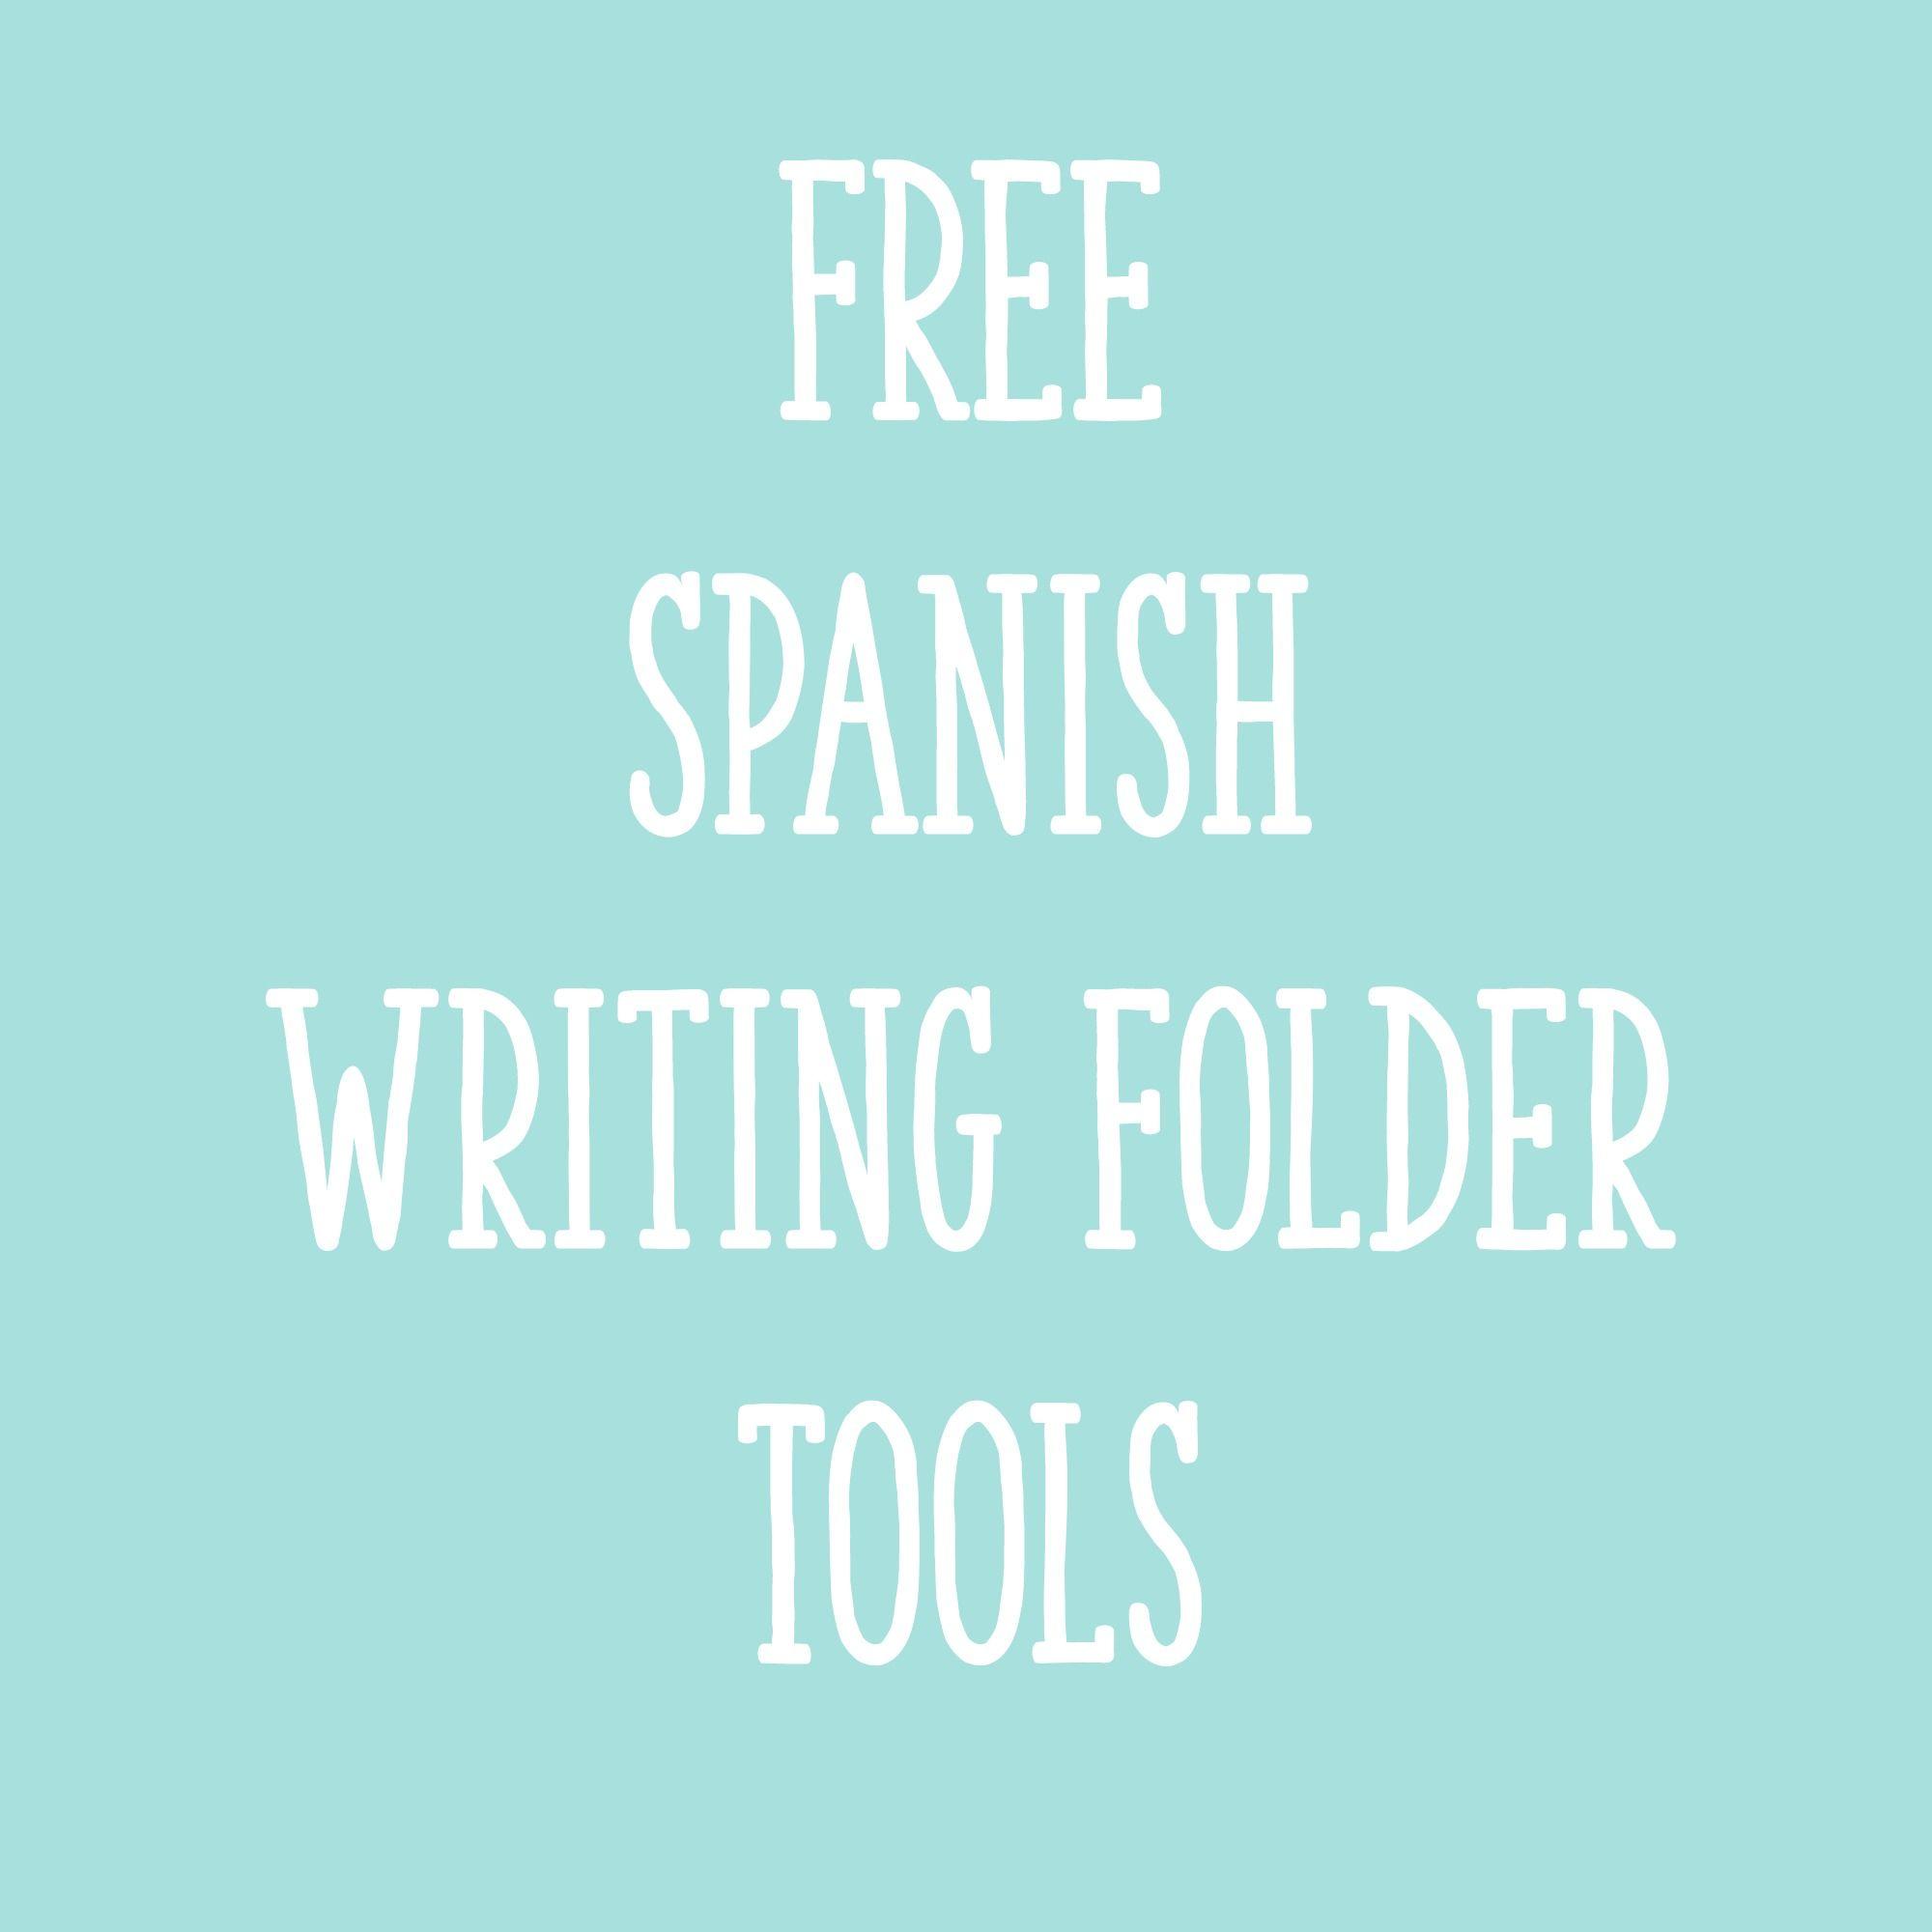 Free Spanish Writing Folder Tools